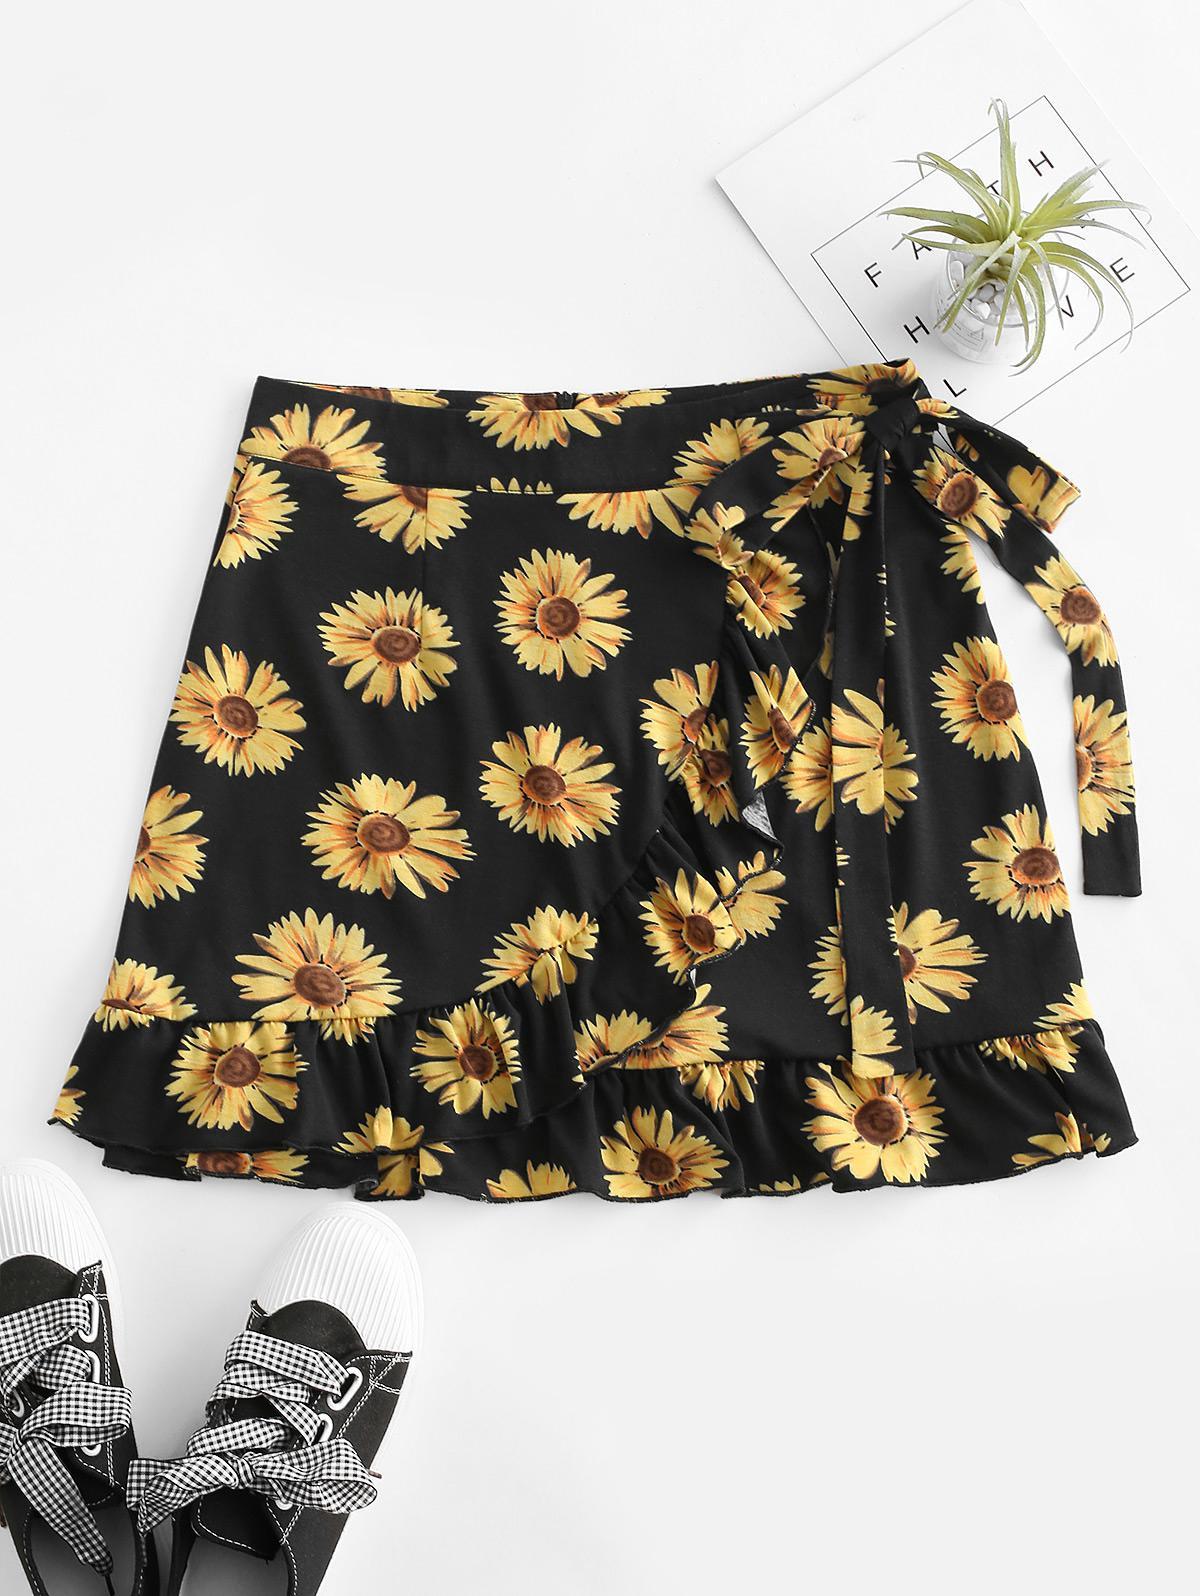 Sunflower Flounce Overlap Knotted Skirt